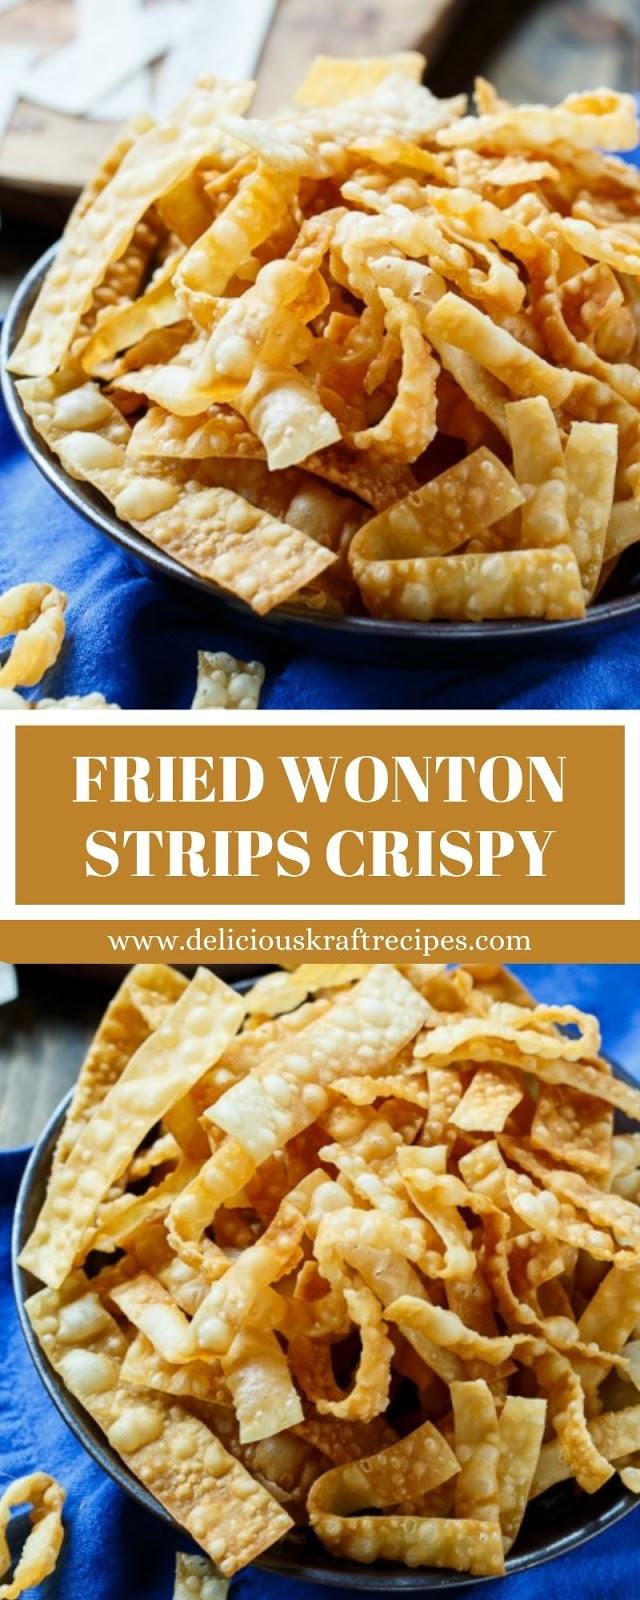 FRIED WONTON STRIPS CRISPY